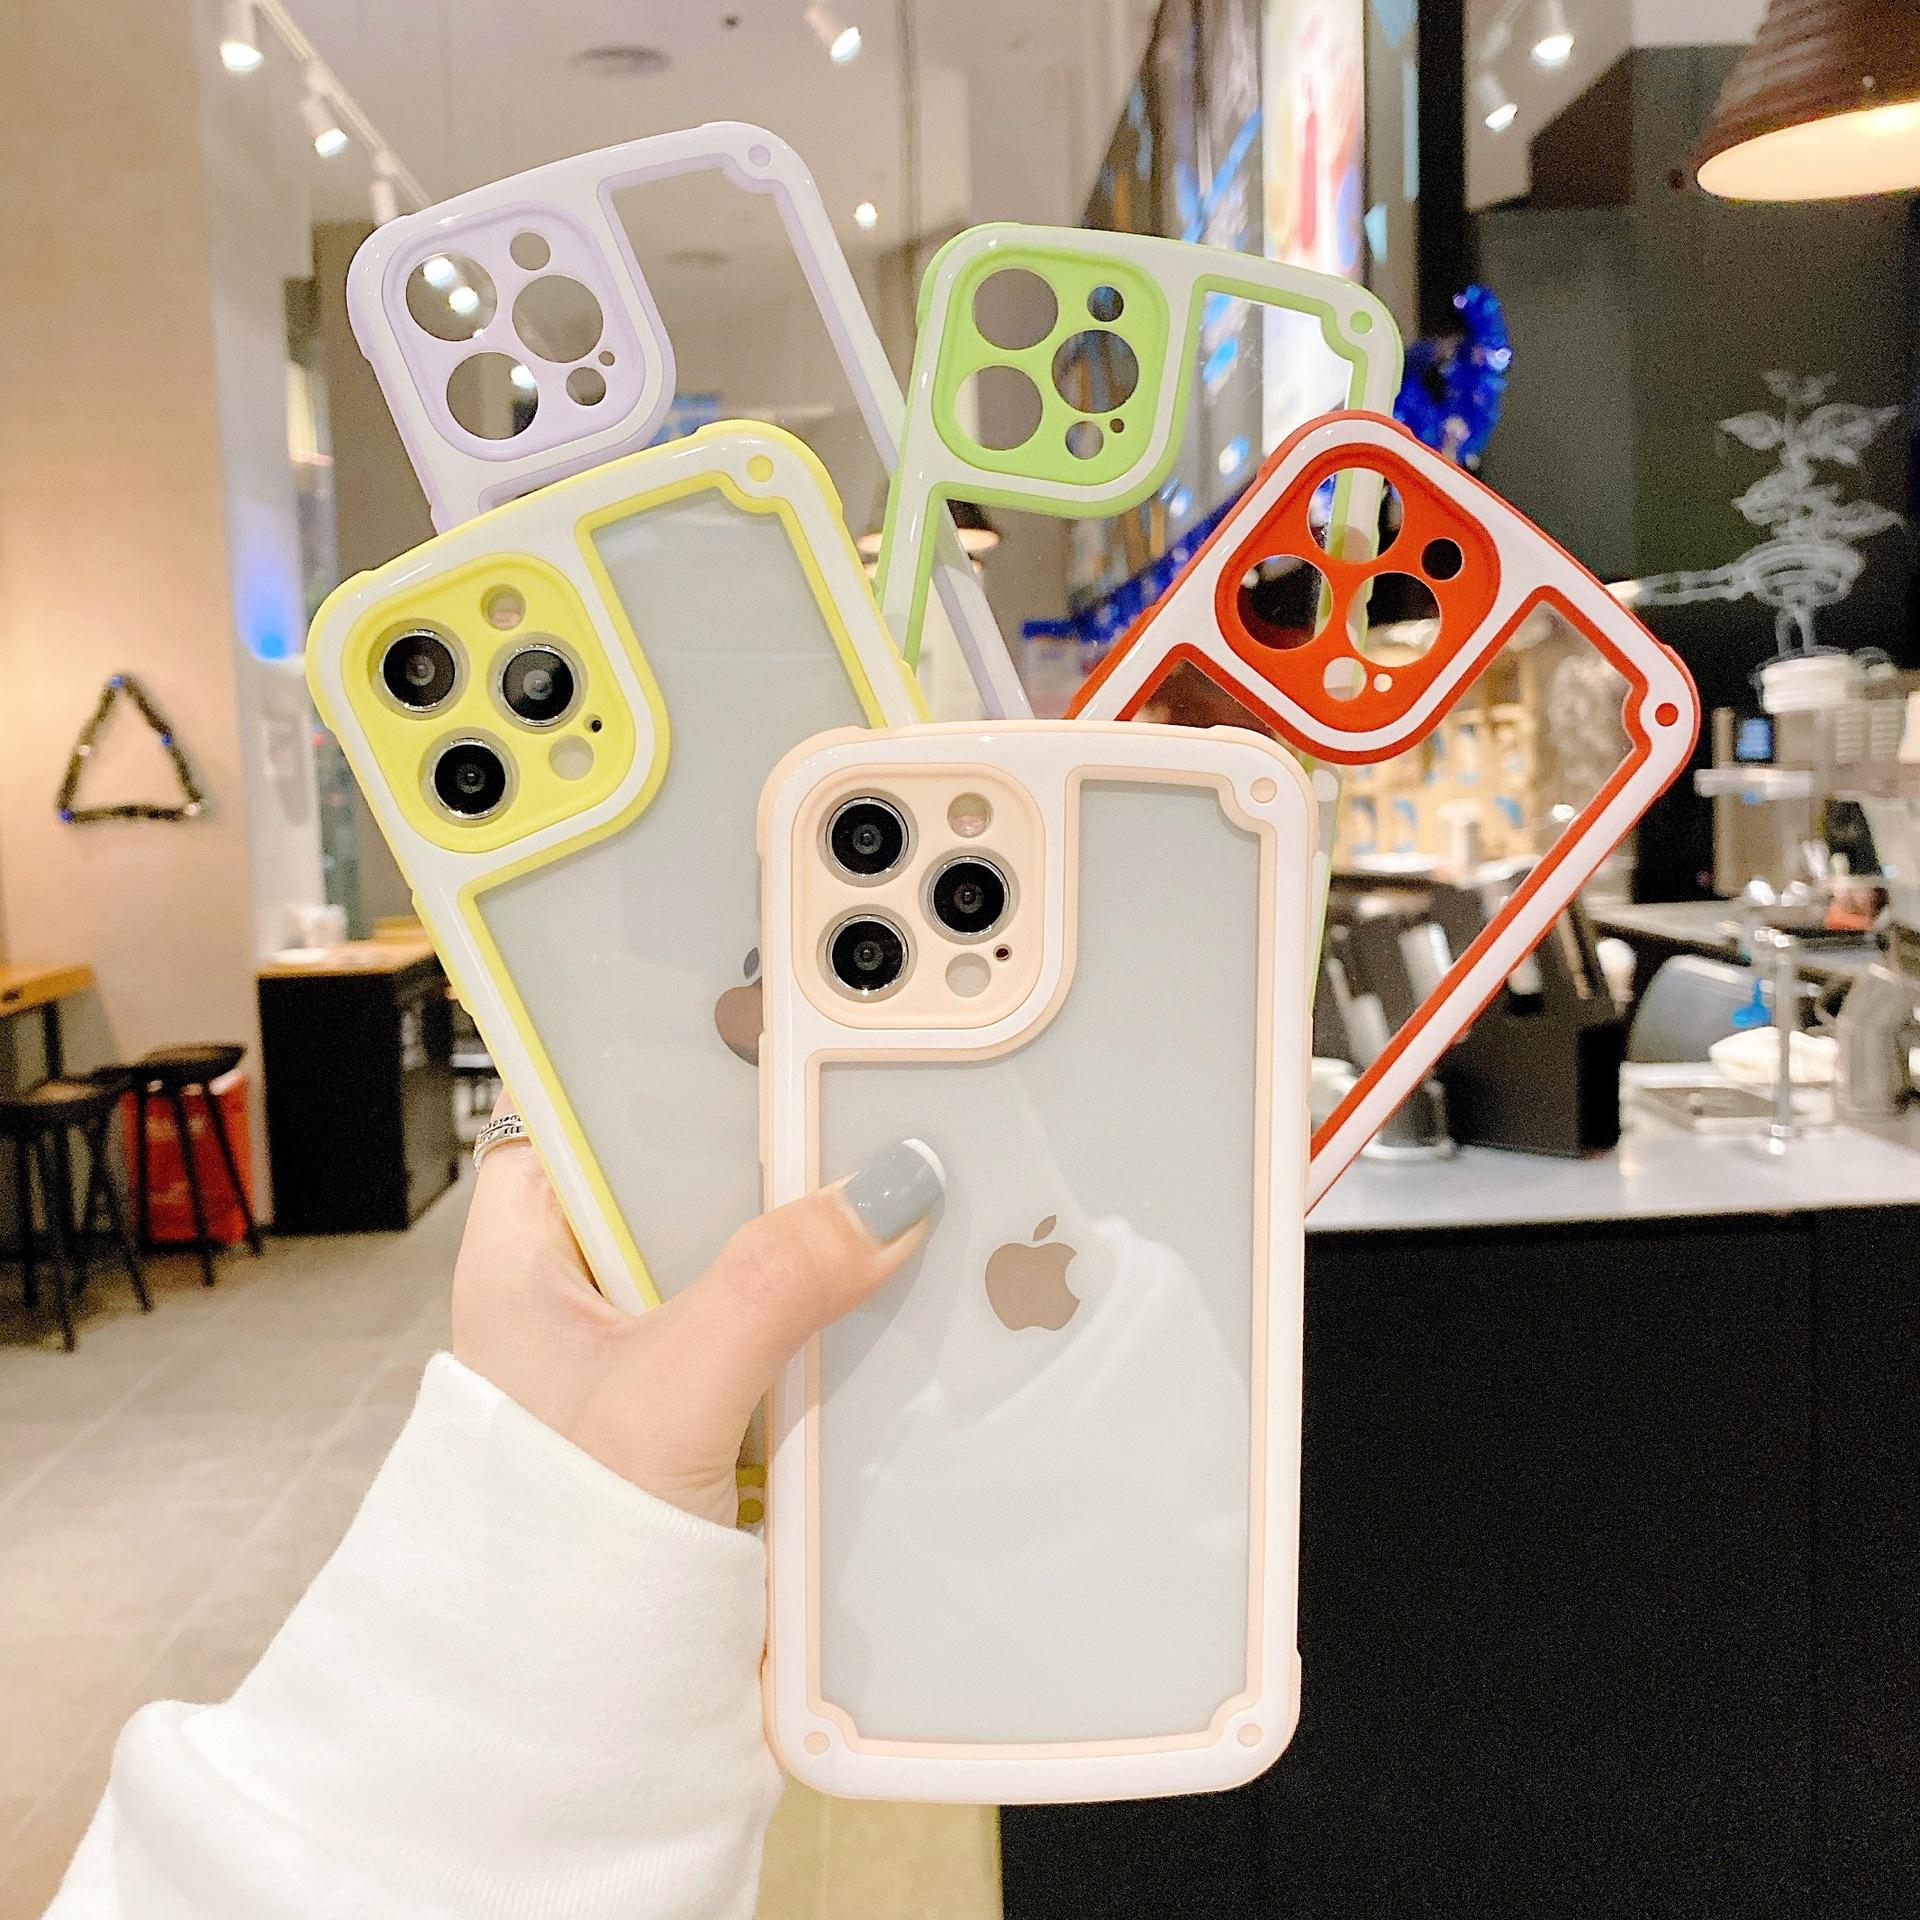 Süßigkeiten Dual Color Military Anti-Shock Clear Phone Cases für iPhone 12 Mini 11 PRO MAX 6 7 8 PLUS XR XS X